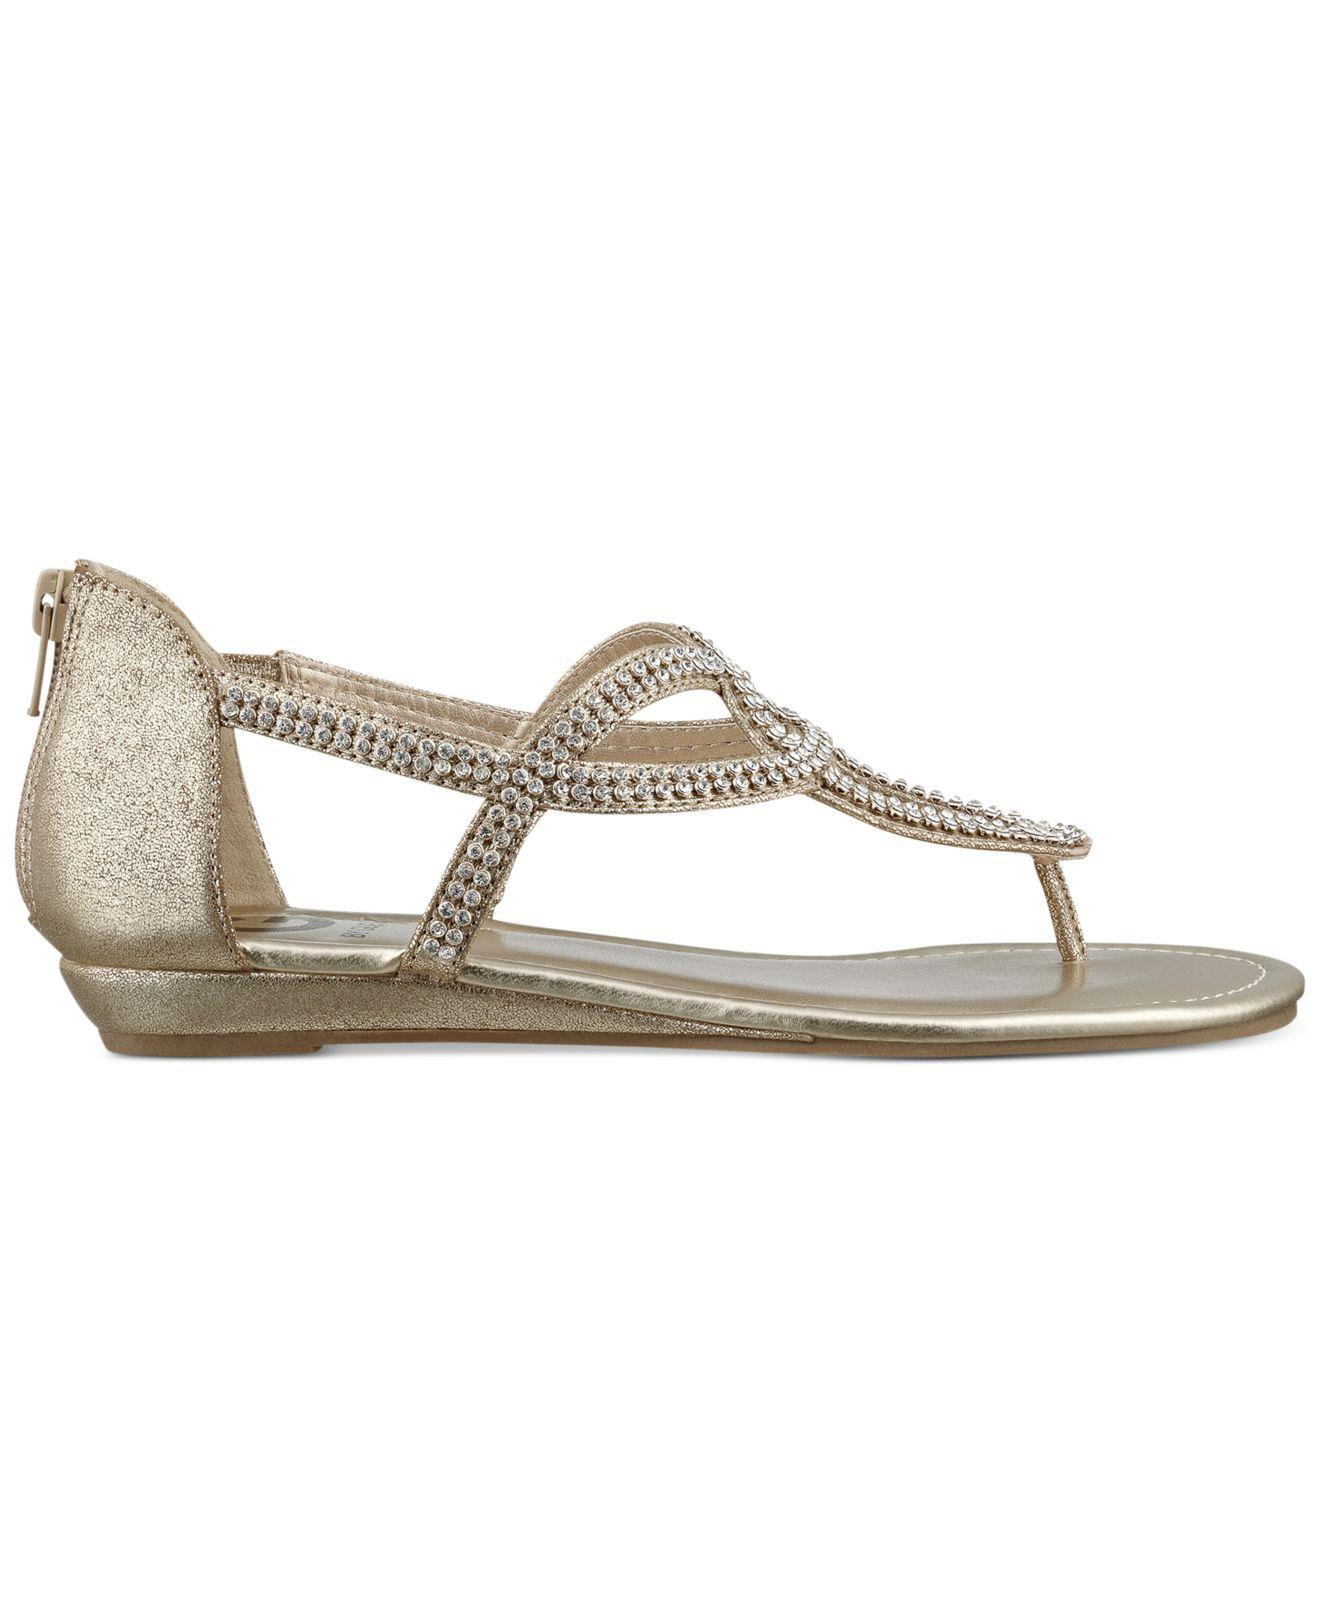 a9283eebfb519 Lyst - G by Guess Women S Jamila Rhinestone Flat Thong Sandals in ...